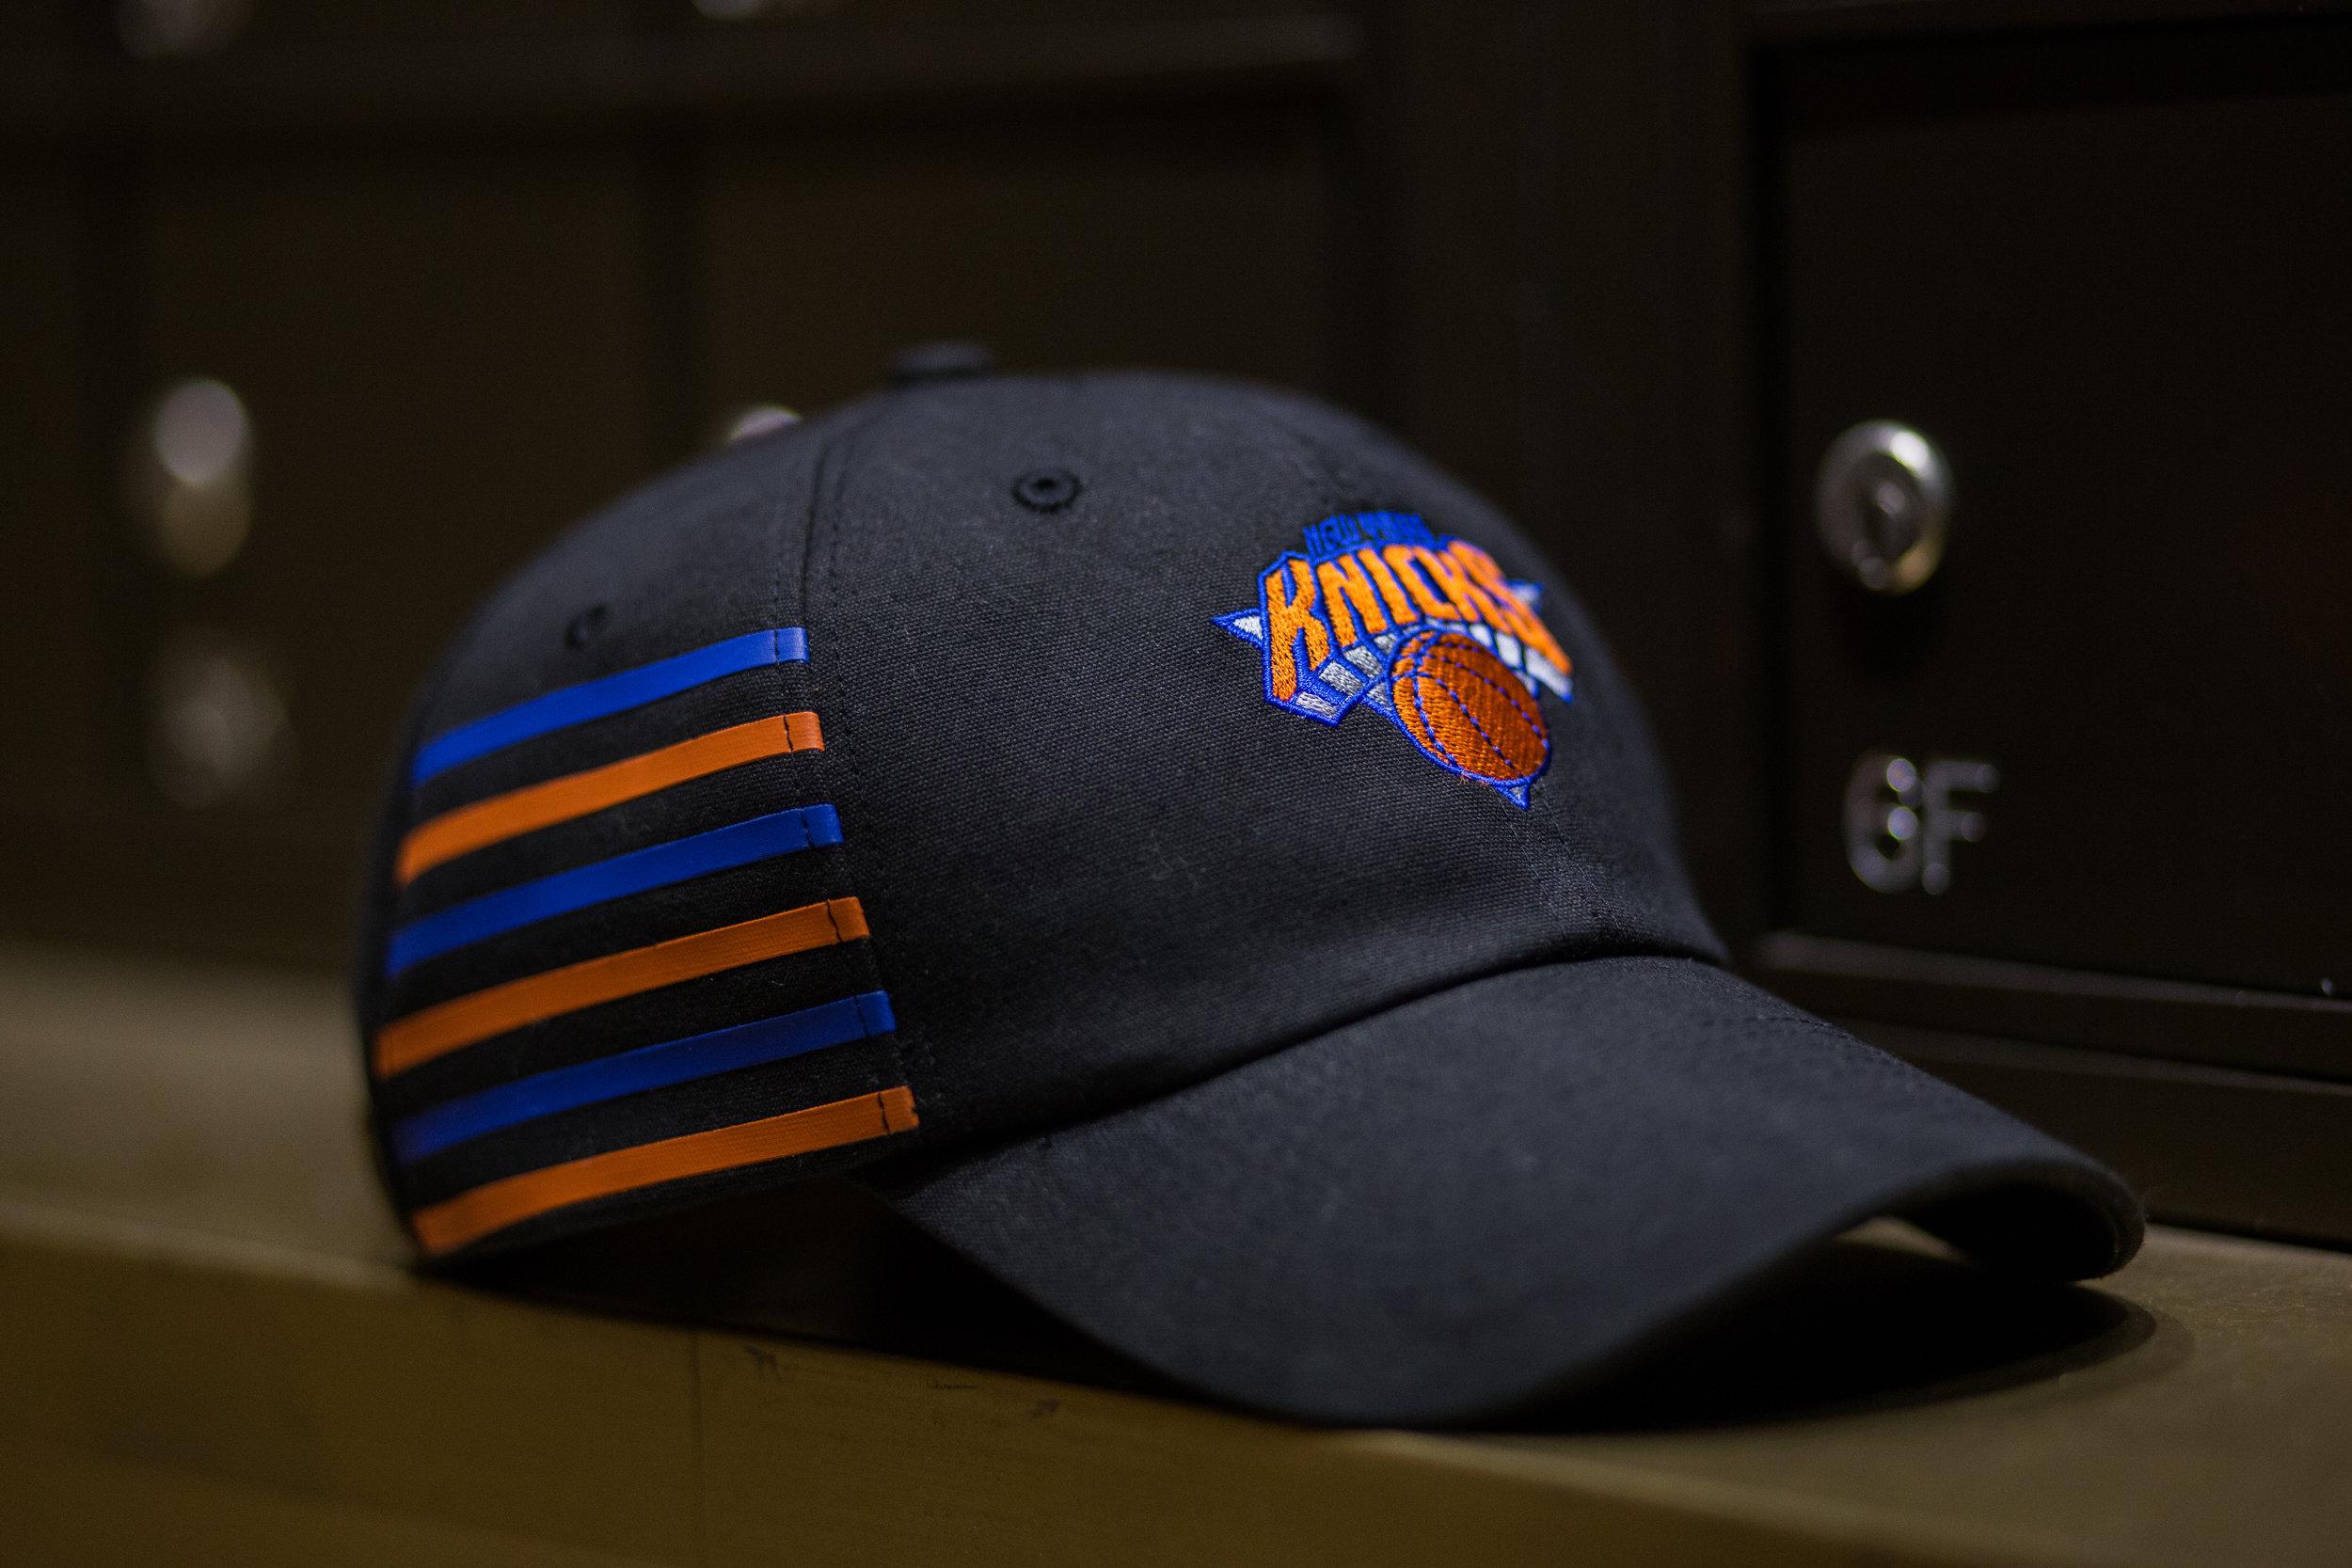 Grungy Gentleman x New York Knicks 16.jpg